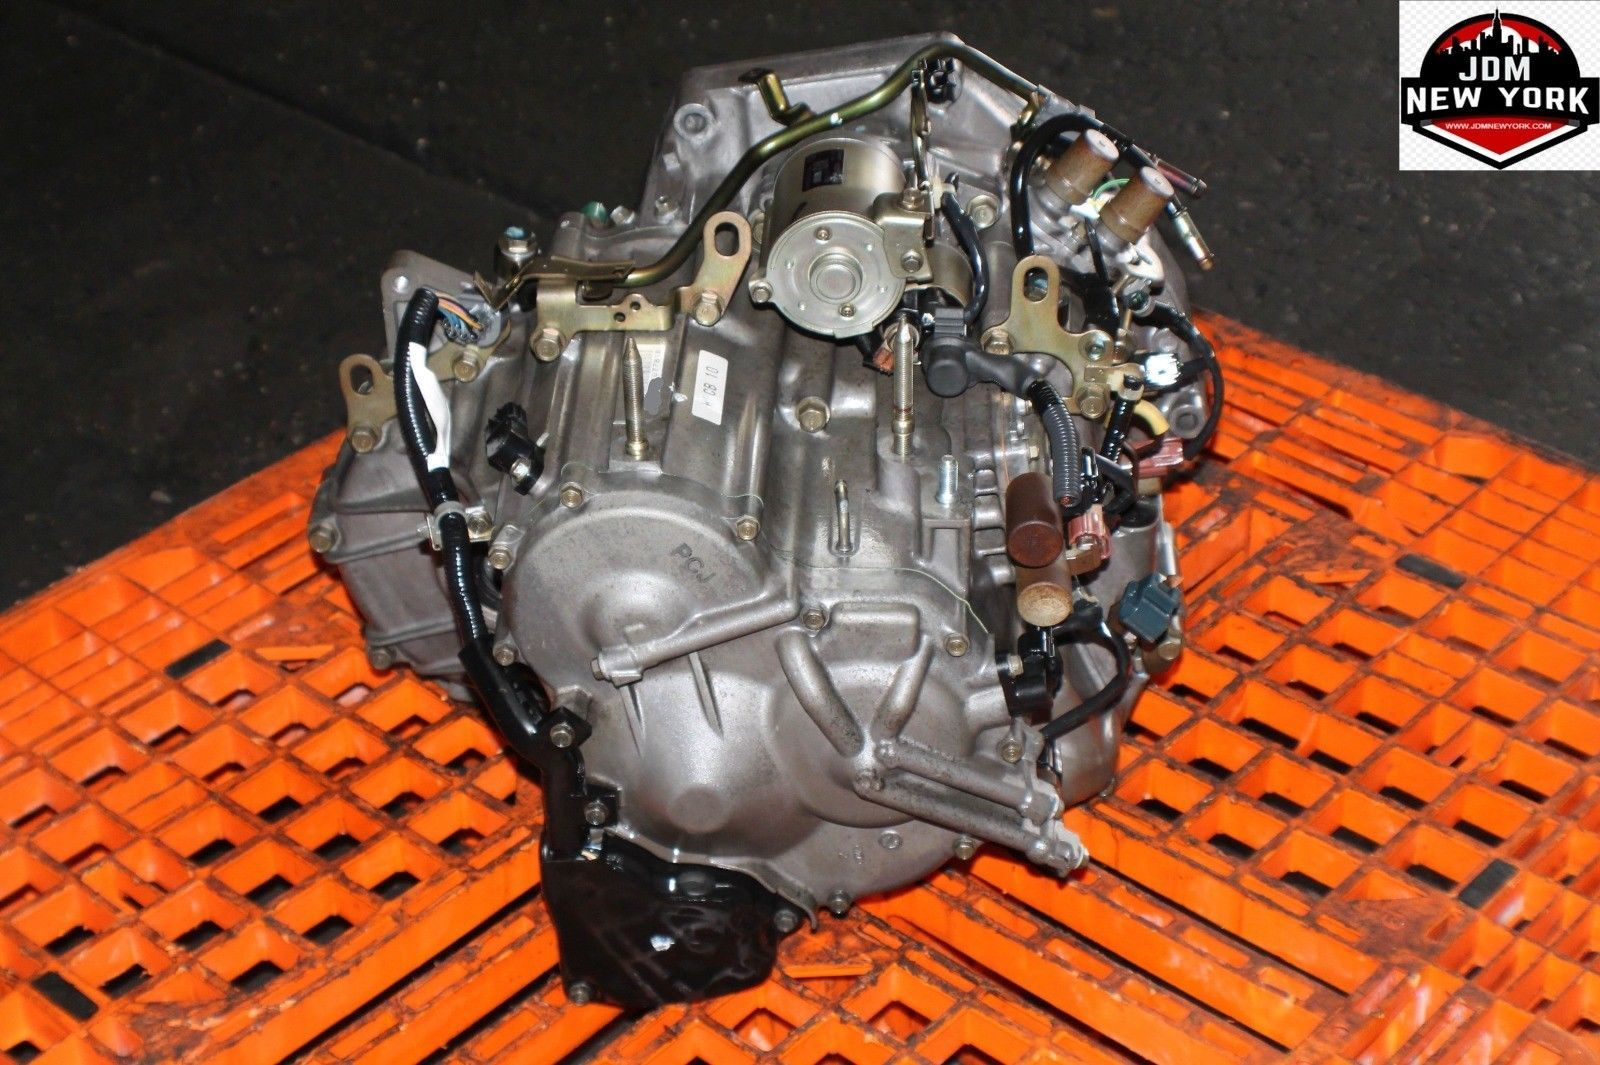 1999 Honda Accord Ex Transmission Problems 99 Replacement Cost V6 Rebuild Fluid Change Fill Honda Accord Ex Honda Accord Transmission